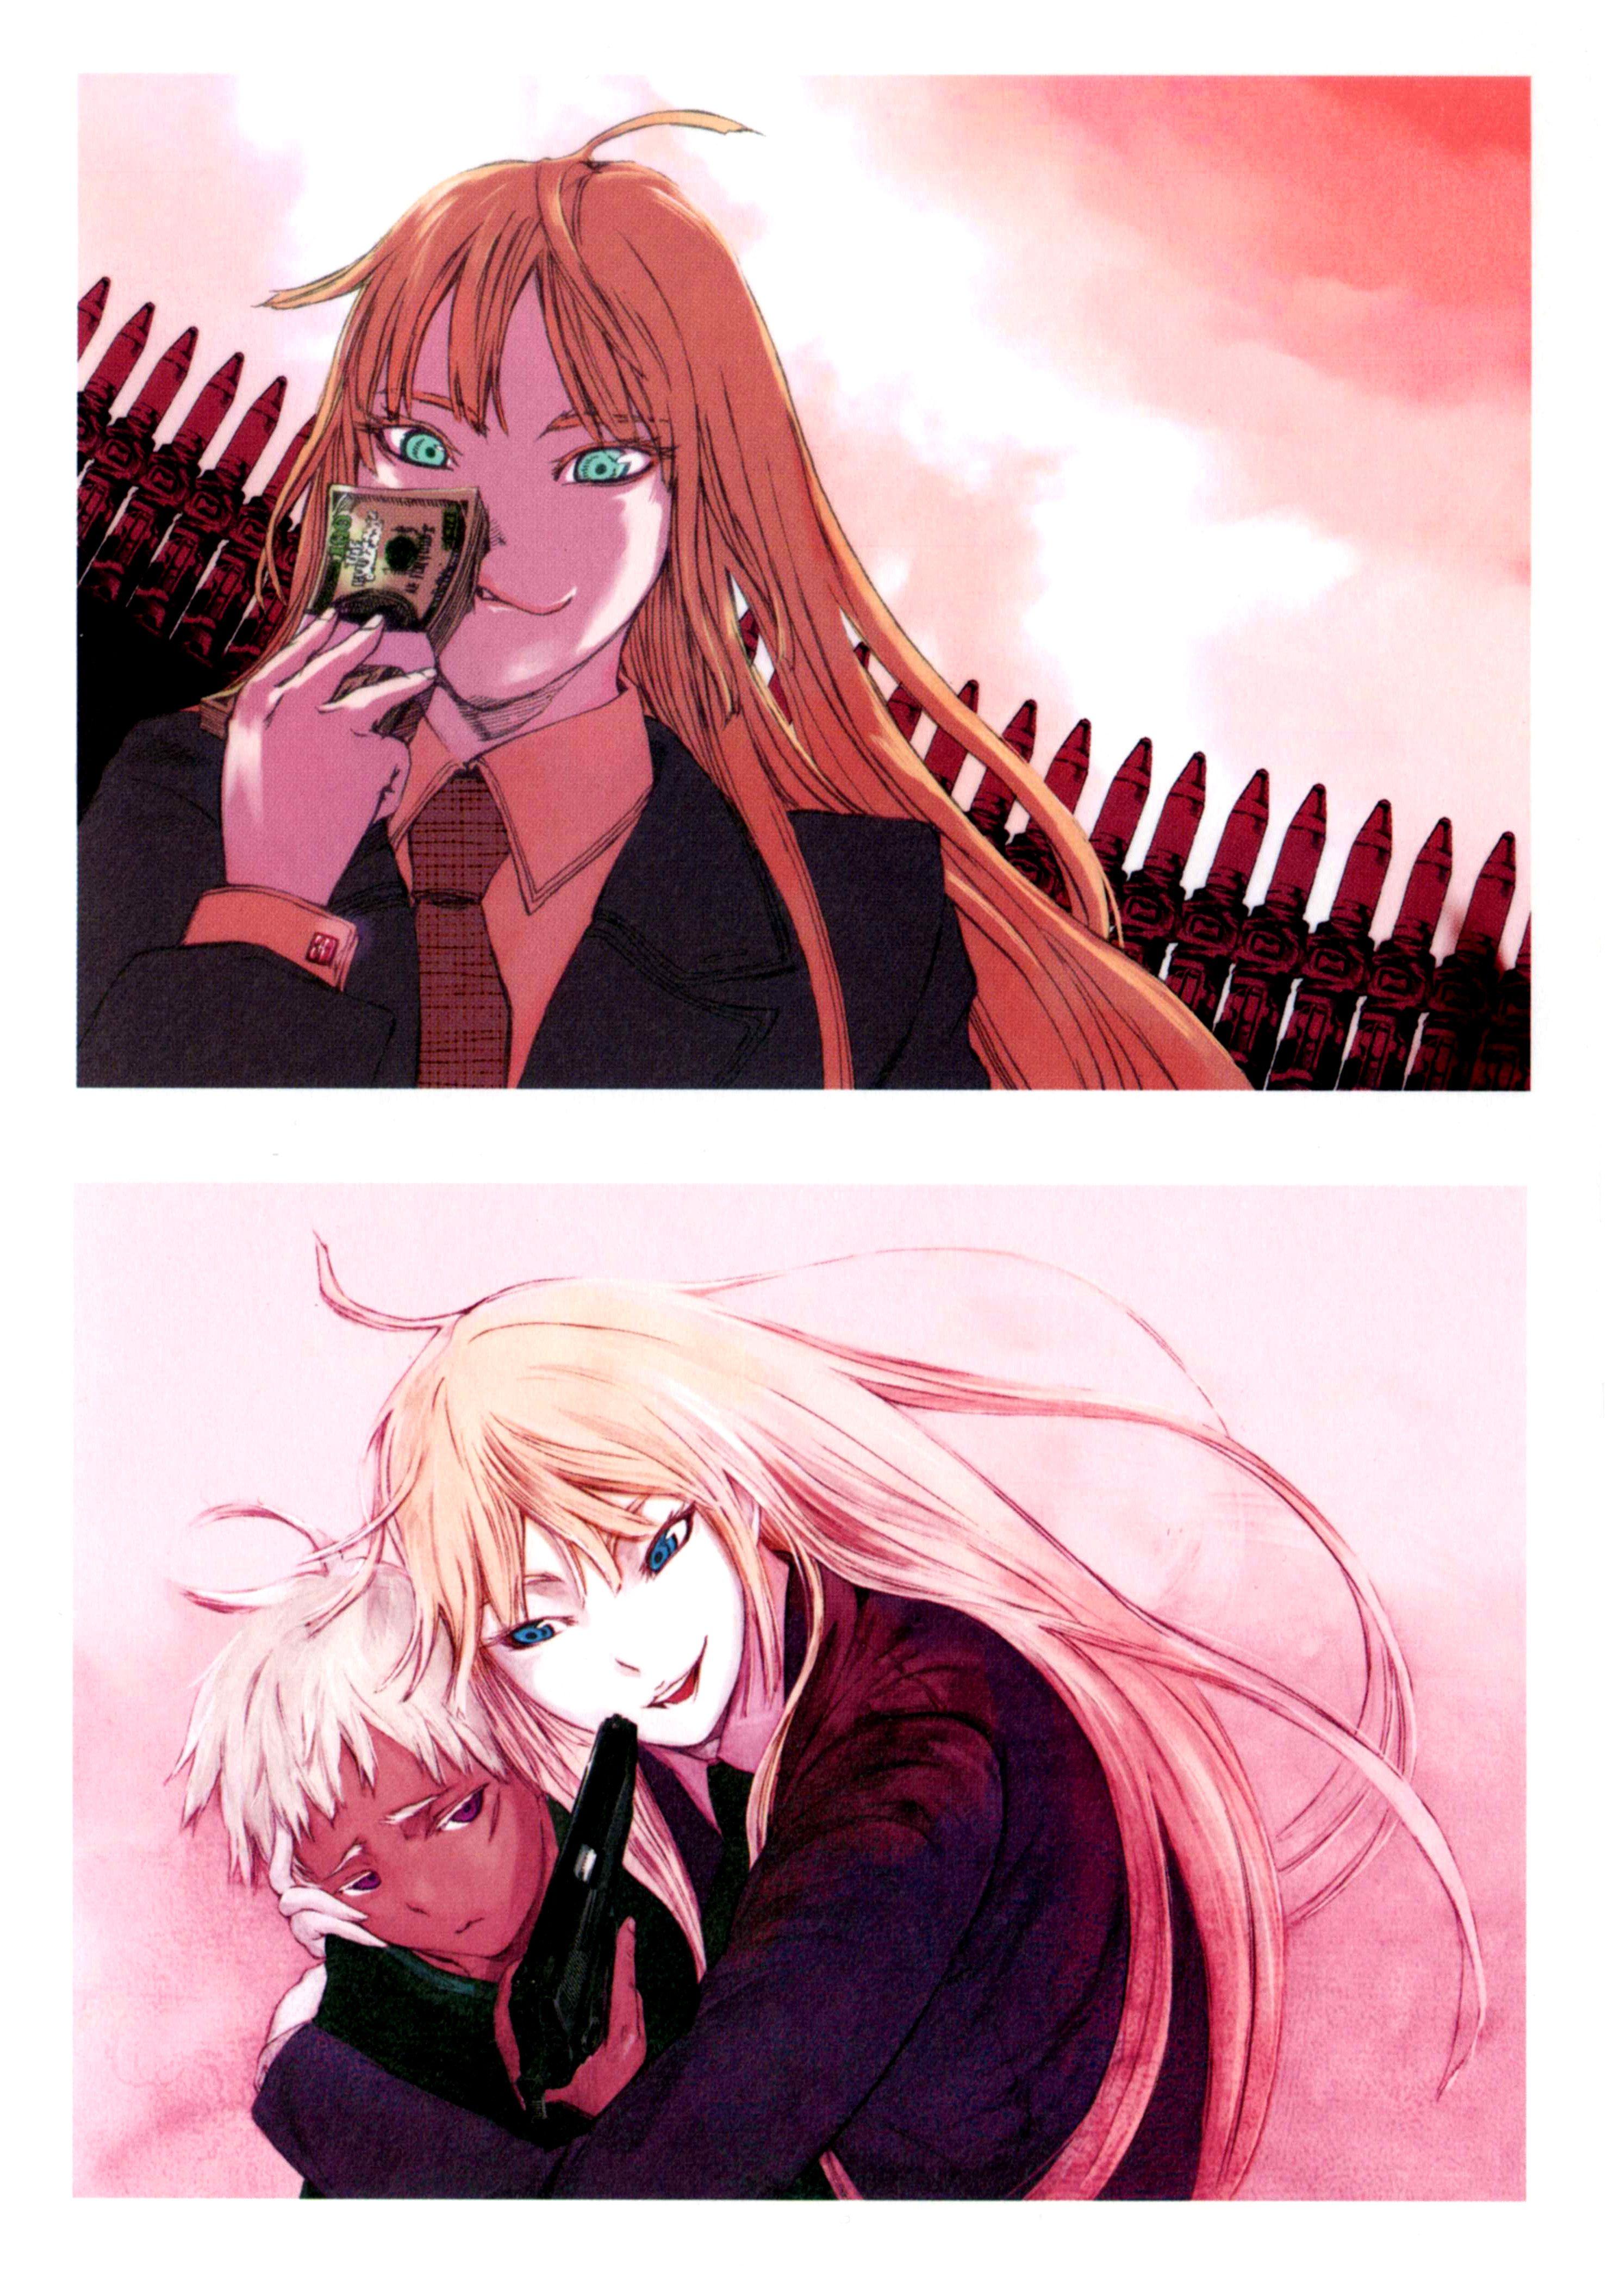 Anime Jormungand Manga Descendientes 2 Armas